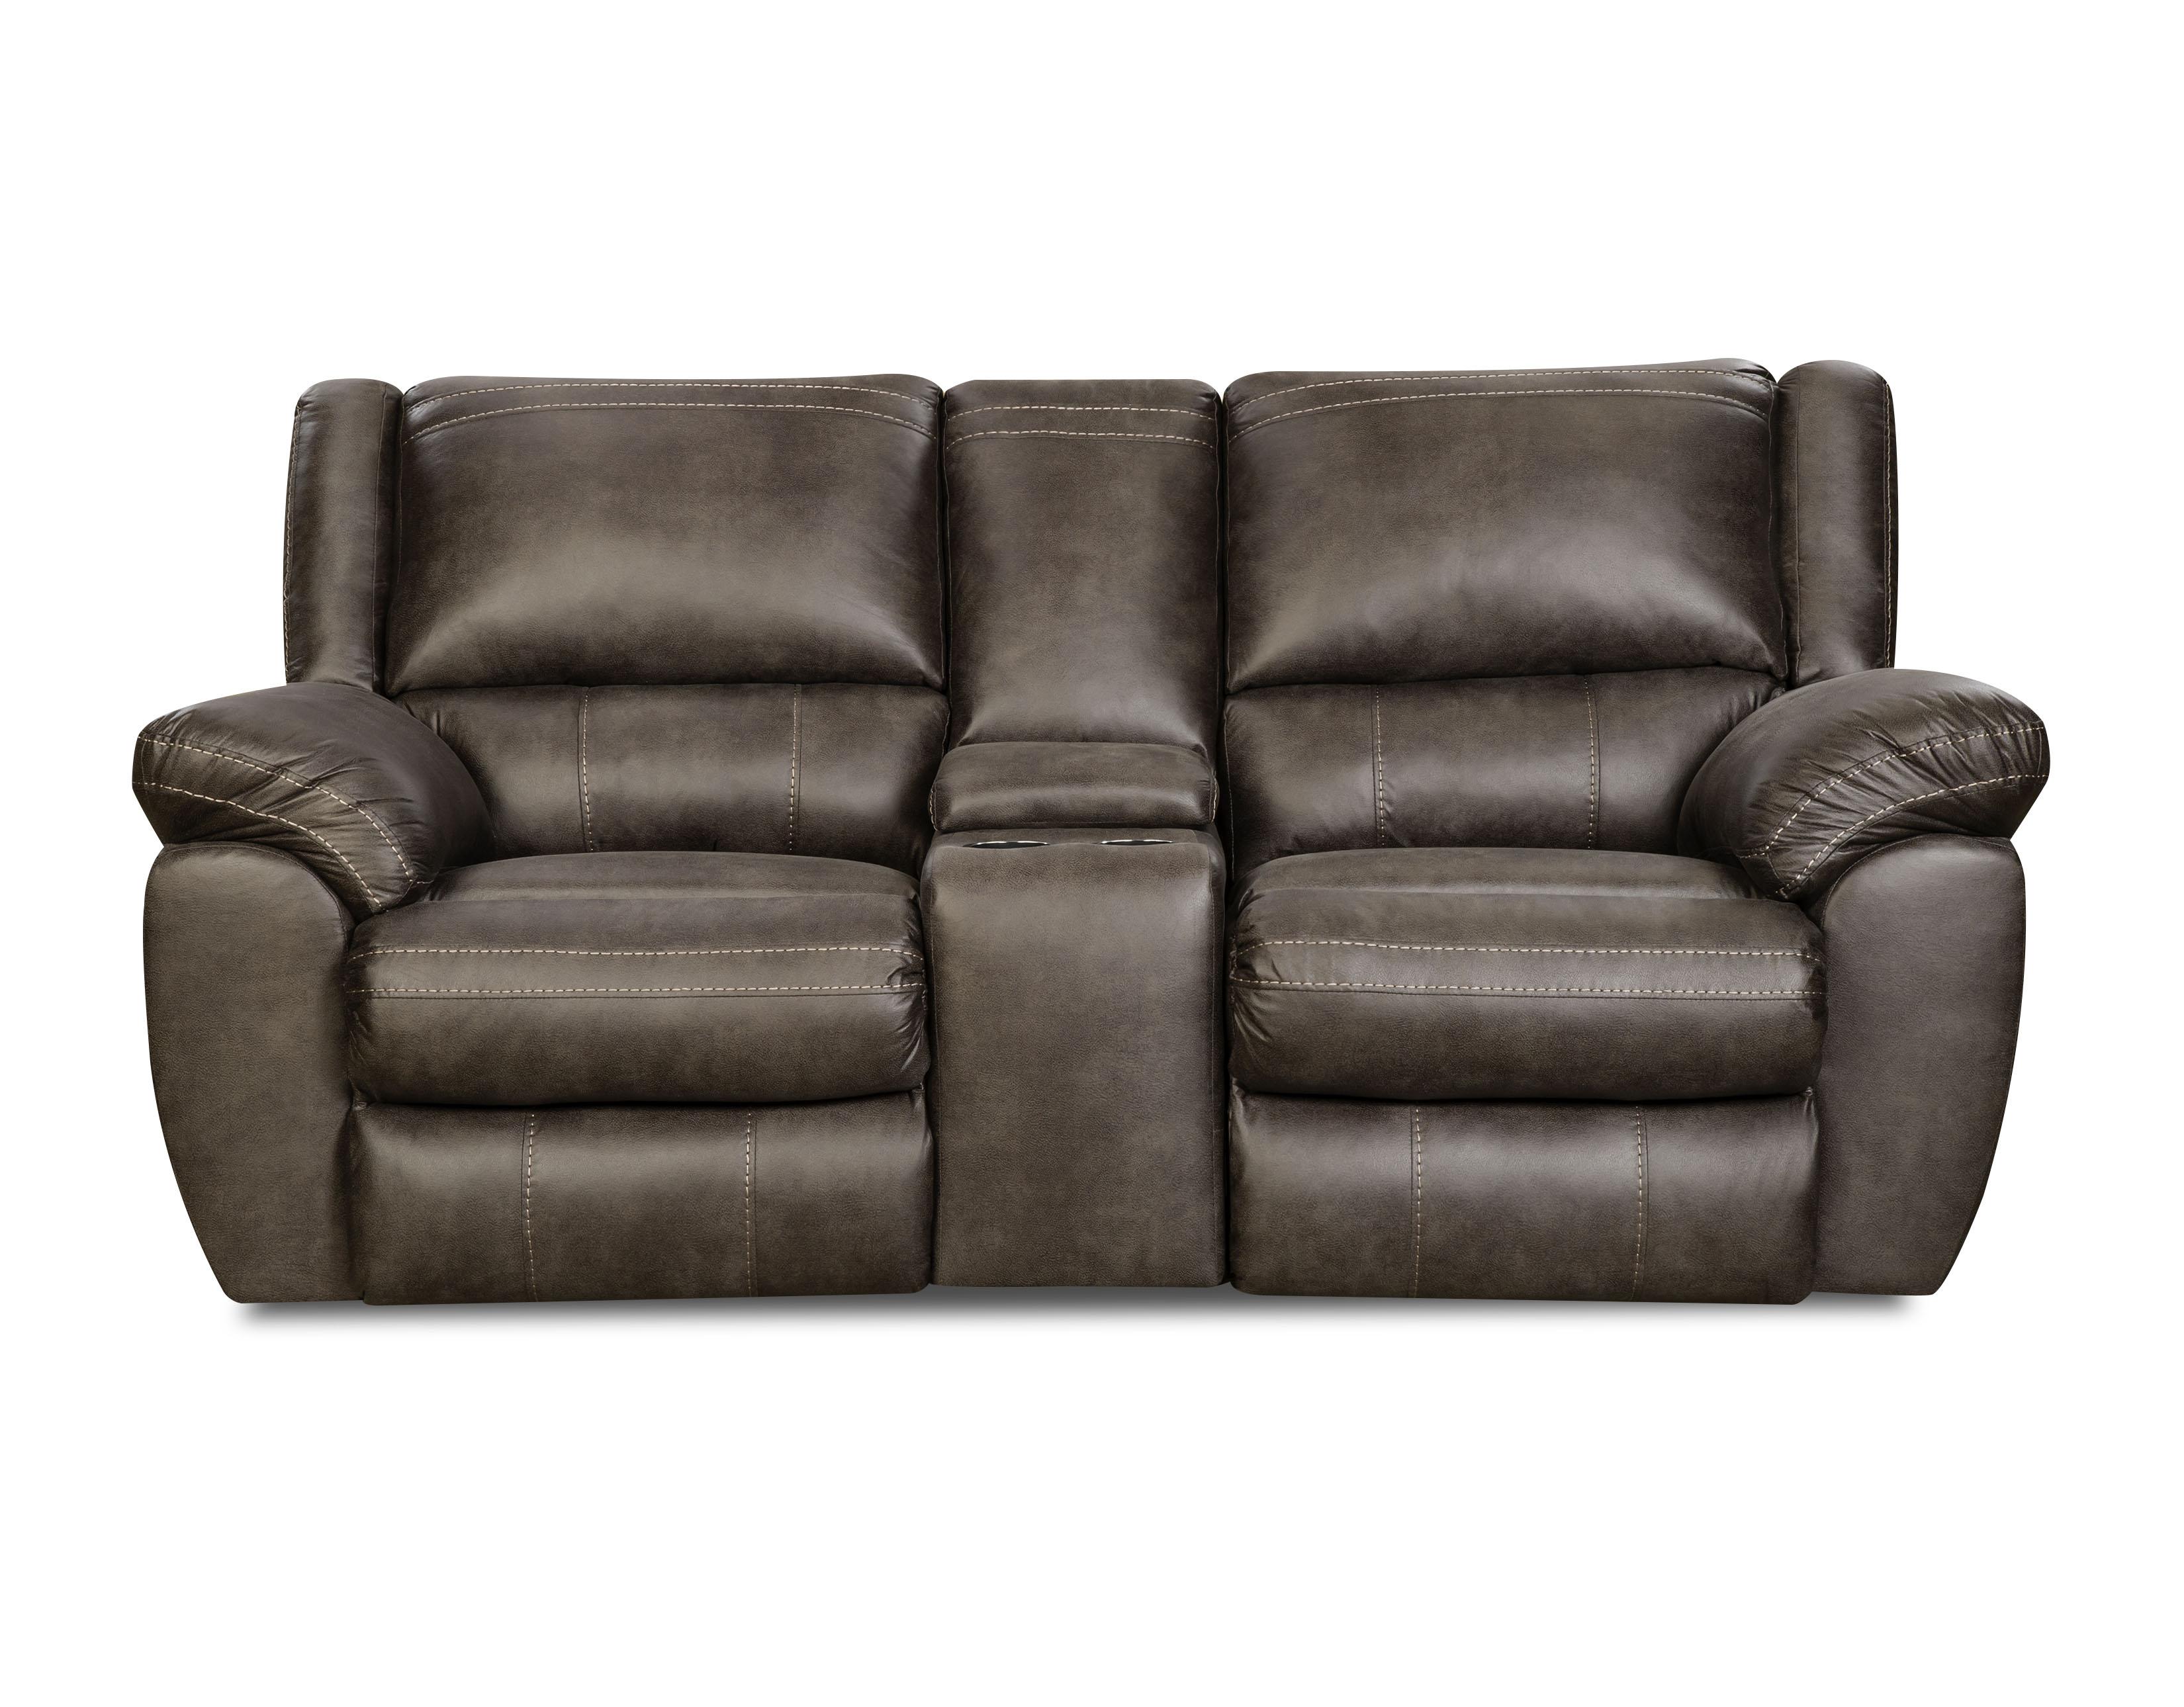 simmons beautyrest motion sofa reviews 2 seater fabric cheap mason reclining loveseat shiloh granite